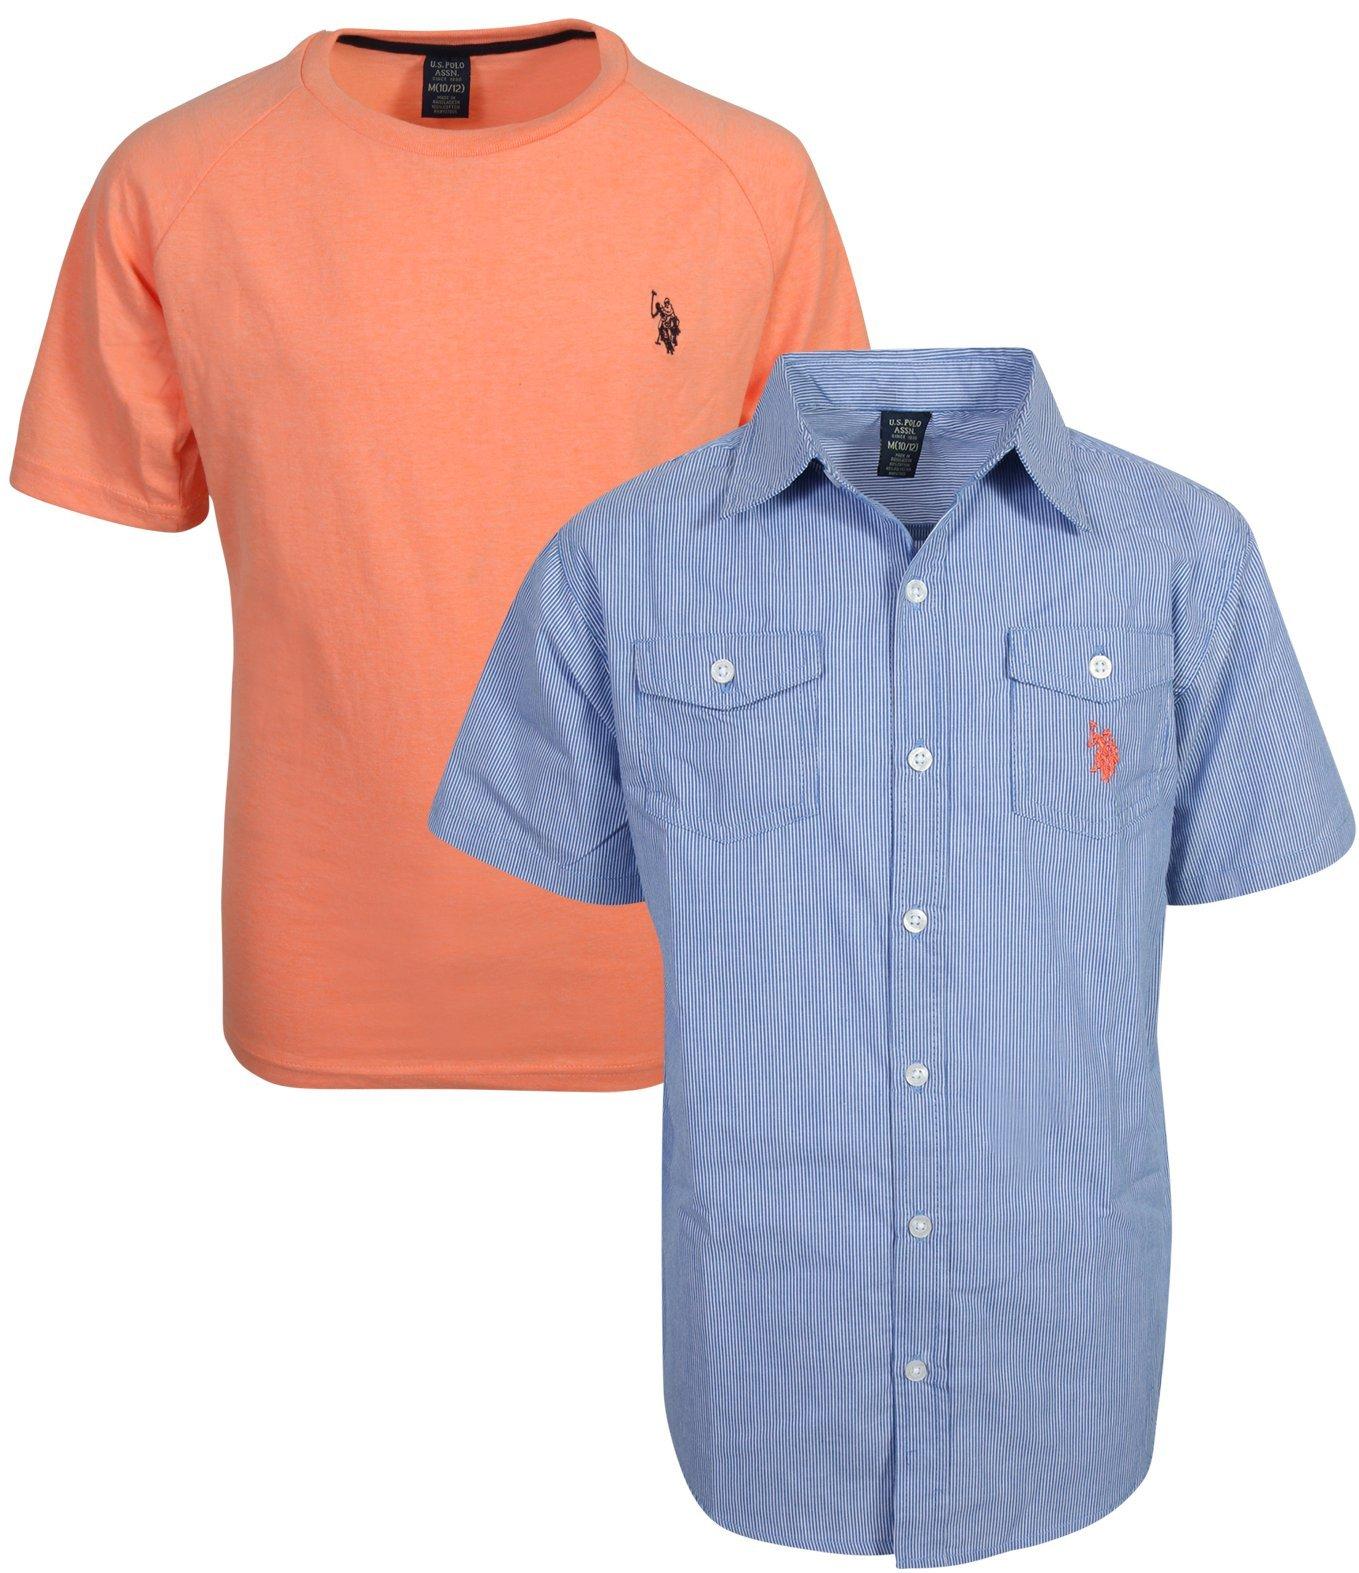 U.S. Polo Assn. Boy's Short Sleeve Button Down Shirt 2 Piece Set, Denim Blue/Coral, Size 7'